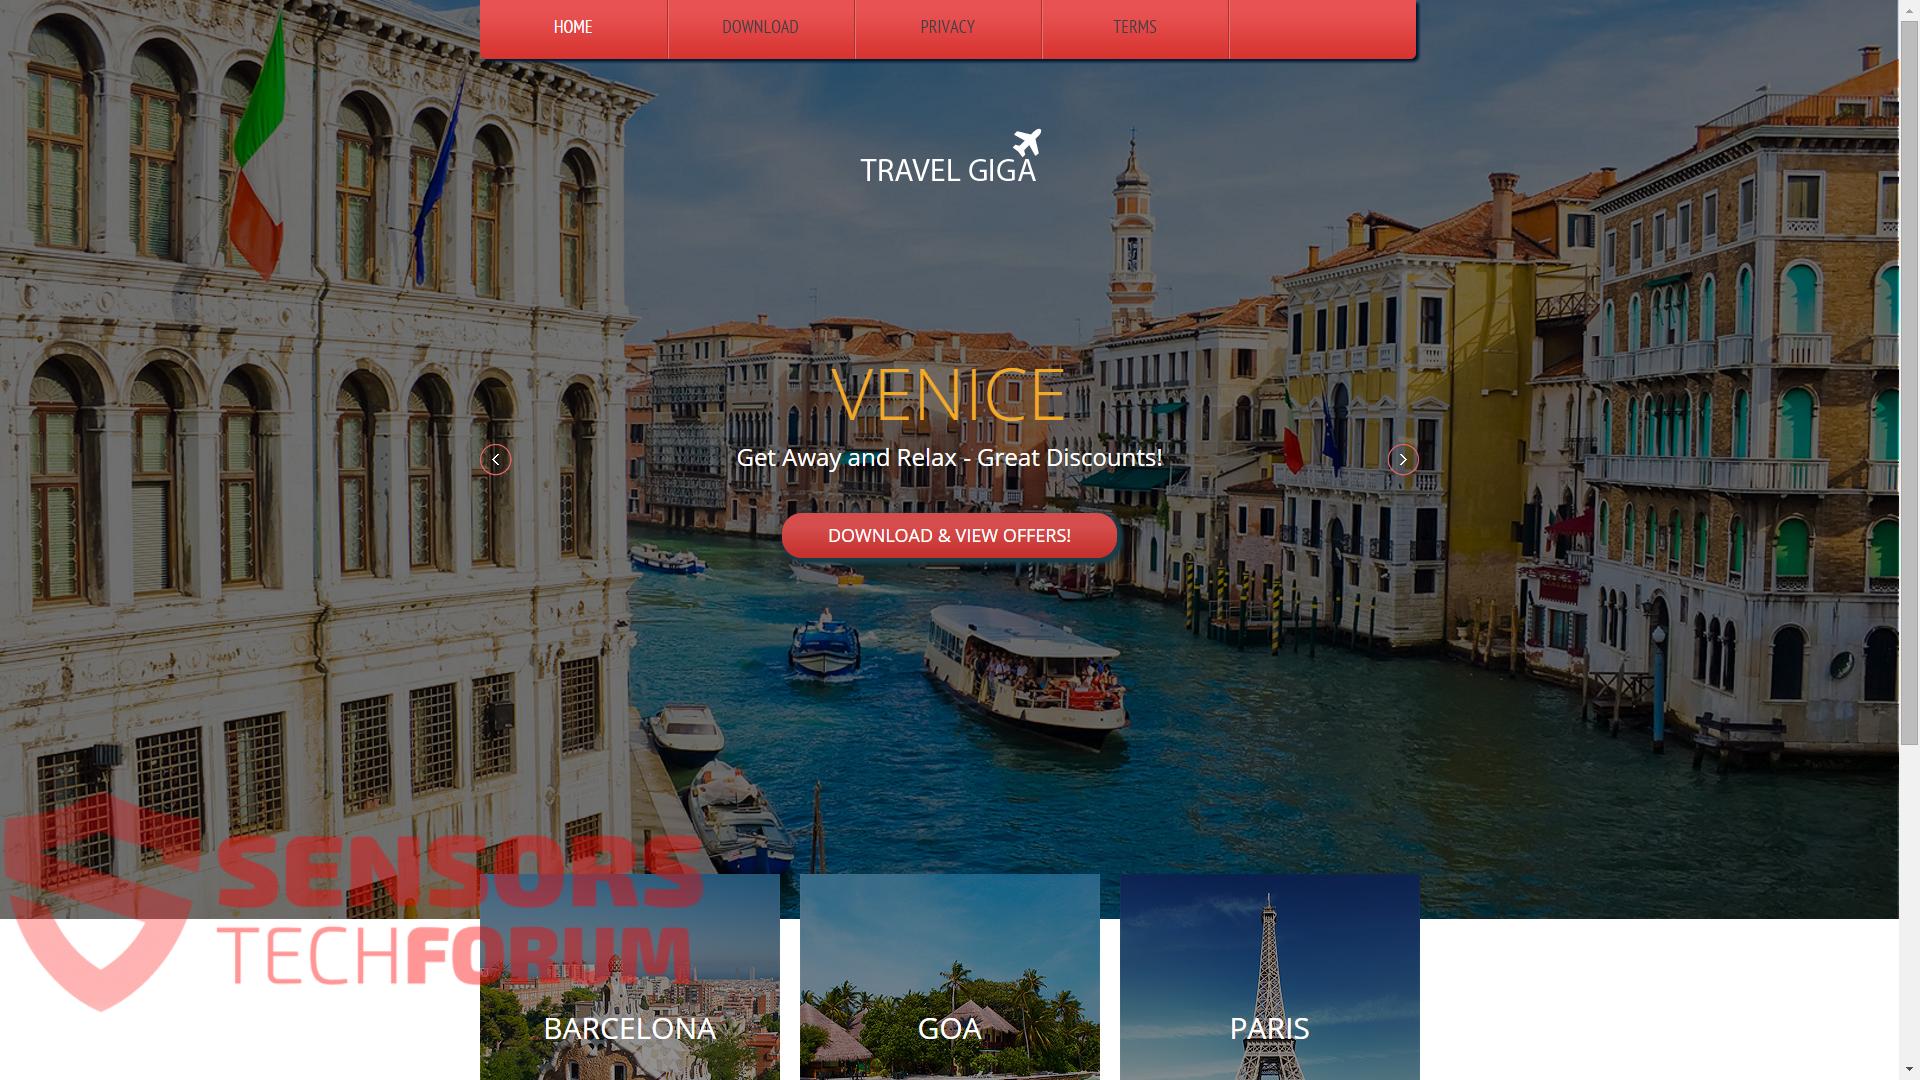 SensorsTechForum-travel-giga-official-site-main-page